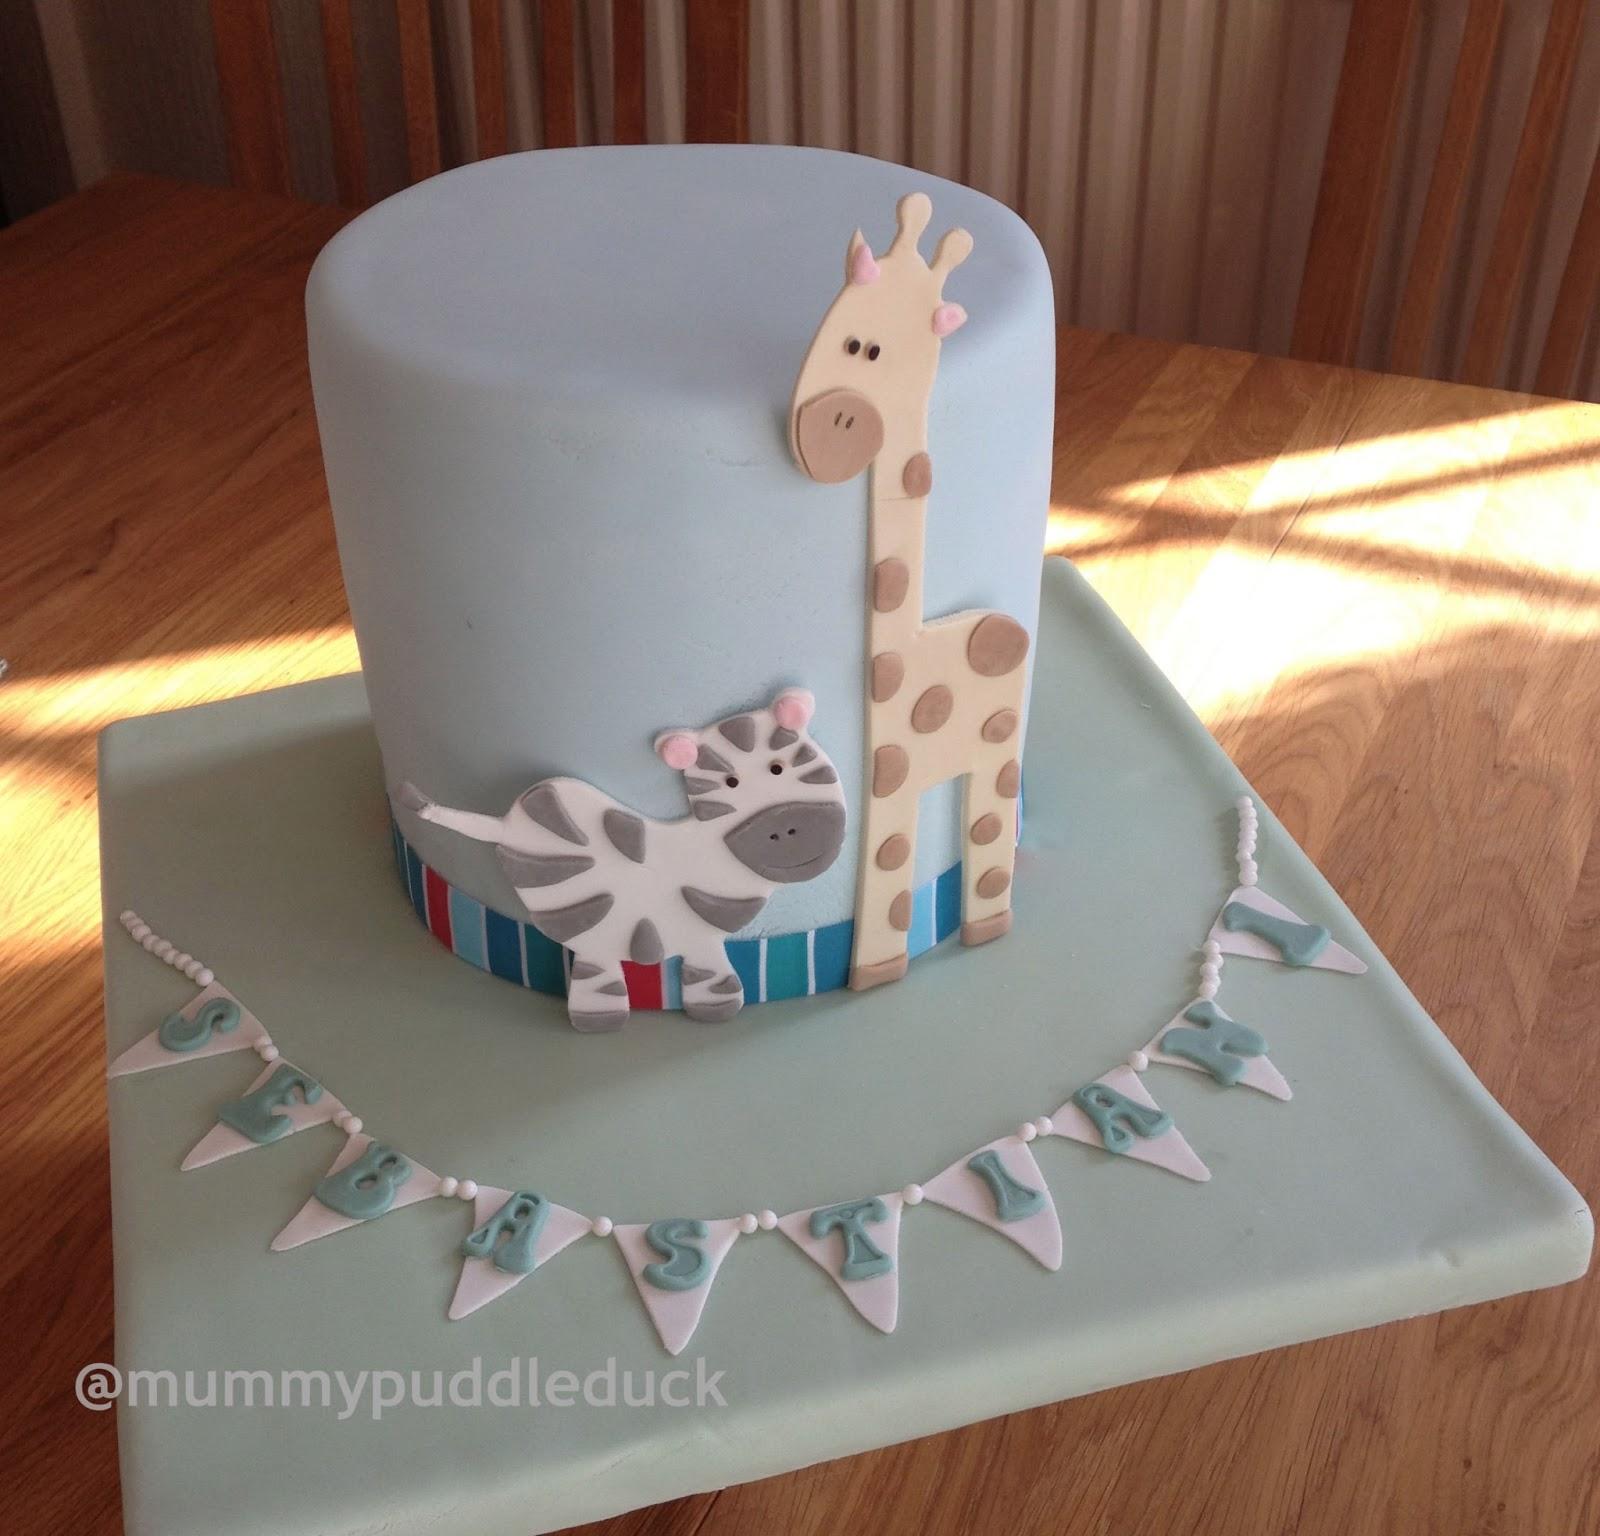 Mummypuddleduck Babys First Cake